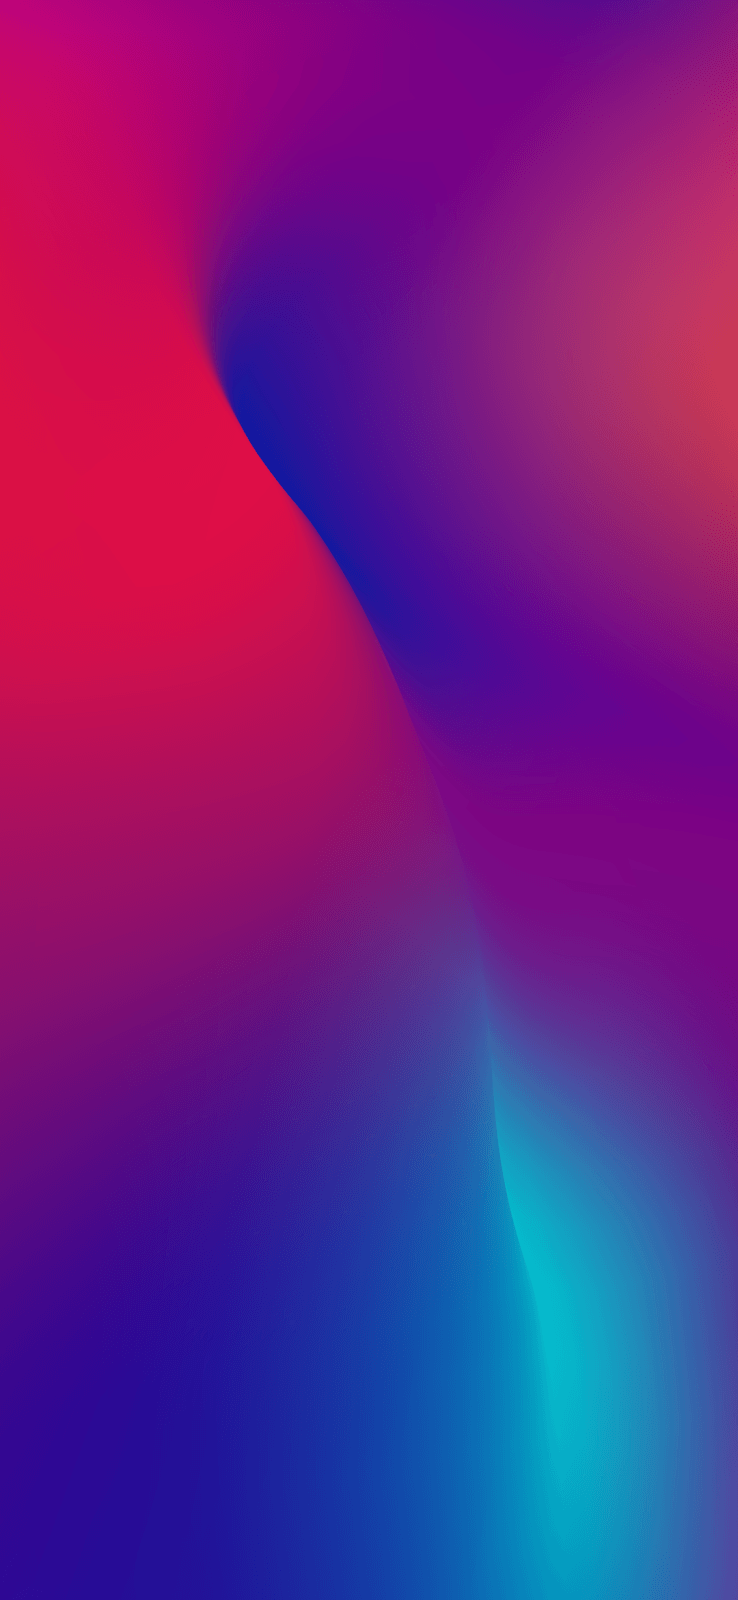 Unduh 710+ Wallpaper Oppo A5s Gratis Terbaik